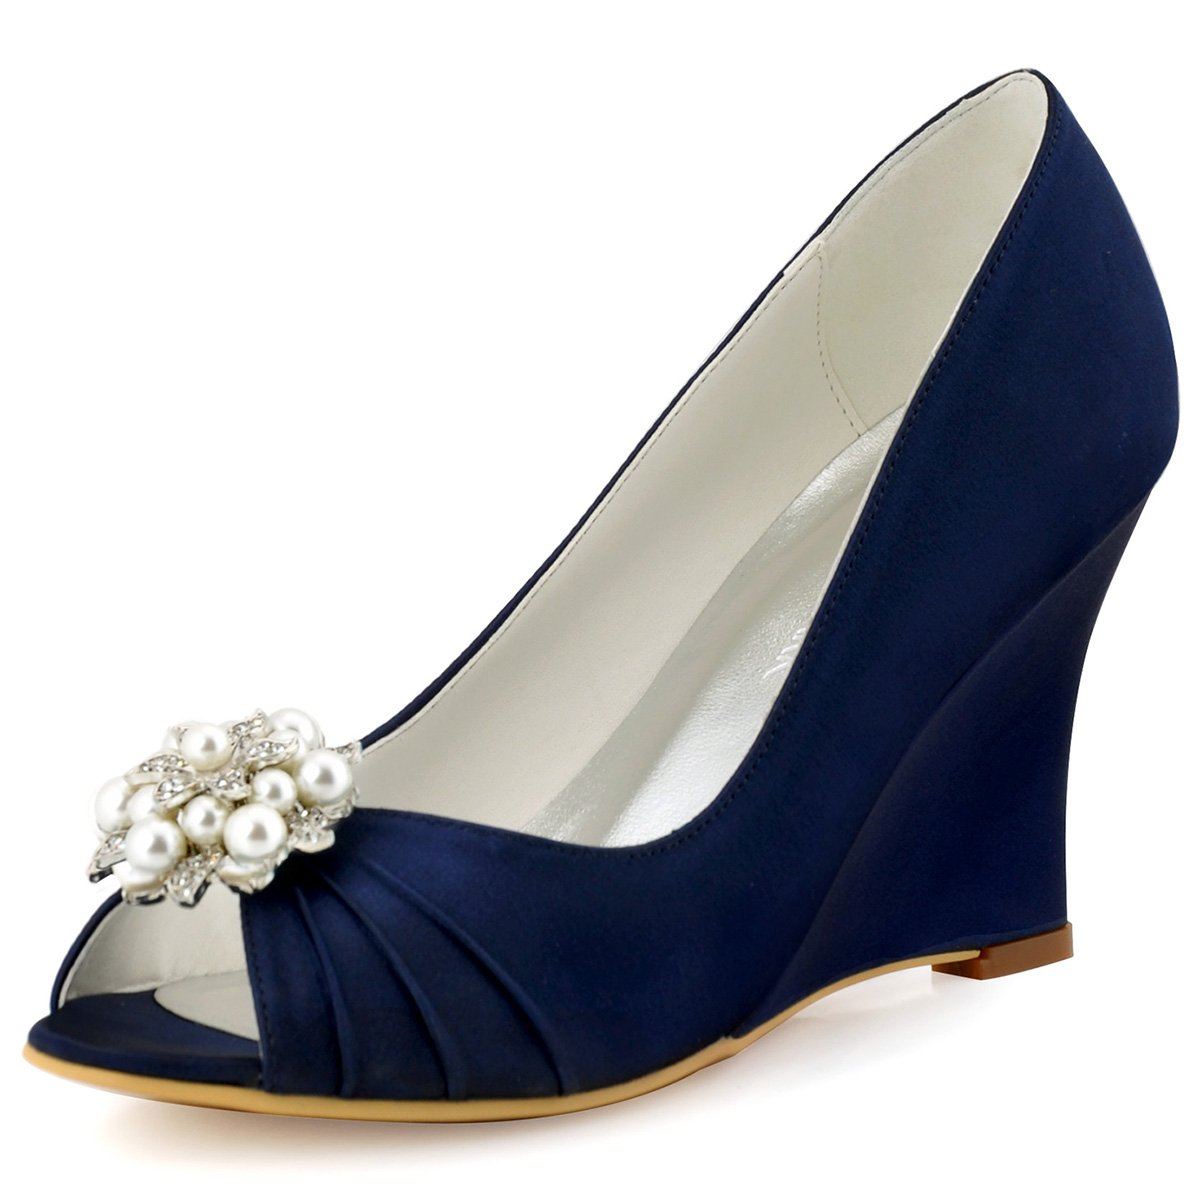 ElegantPark Women High Heel Pumps Peep toe Satin Evening Prom Bridal Wedding Wedges B015MEWZUG 8 B(M) US|Ae01 Navy Blue